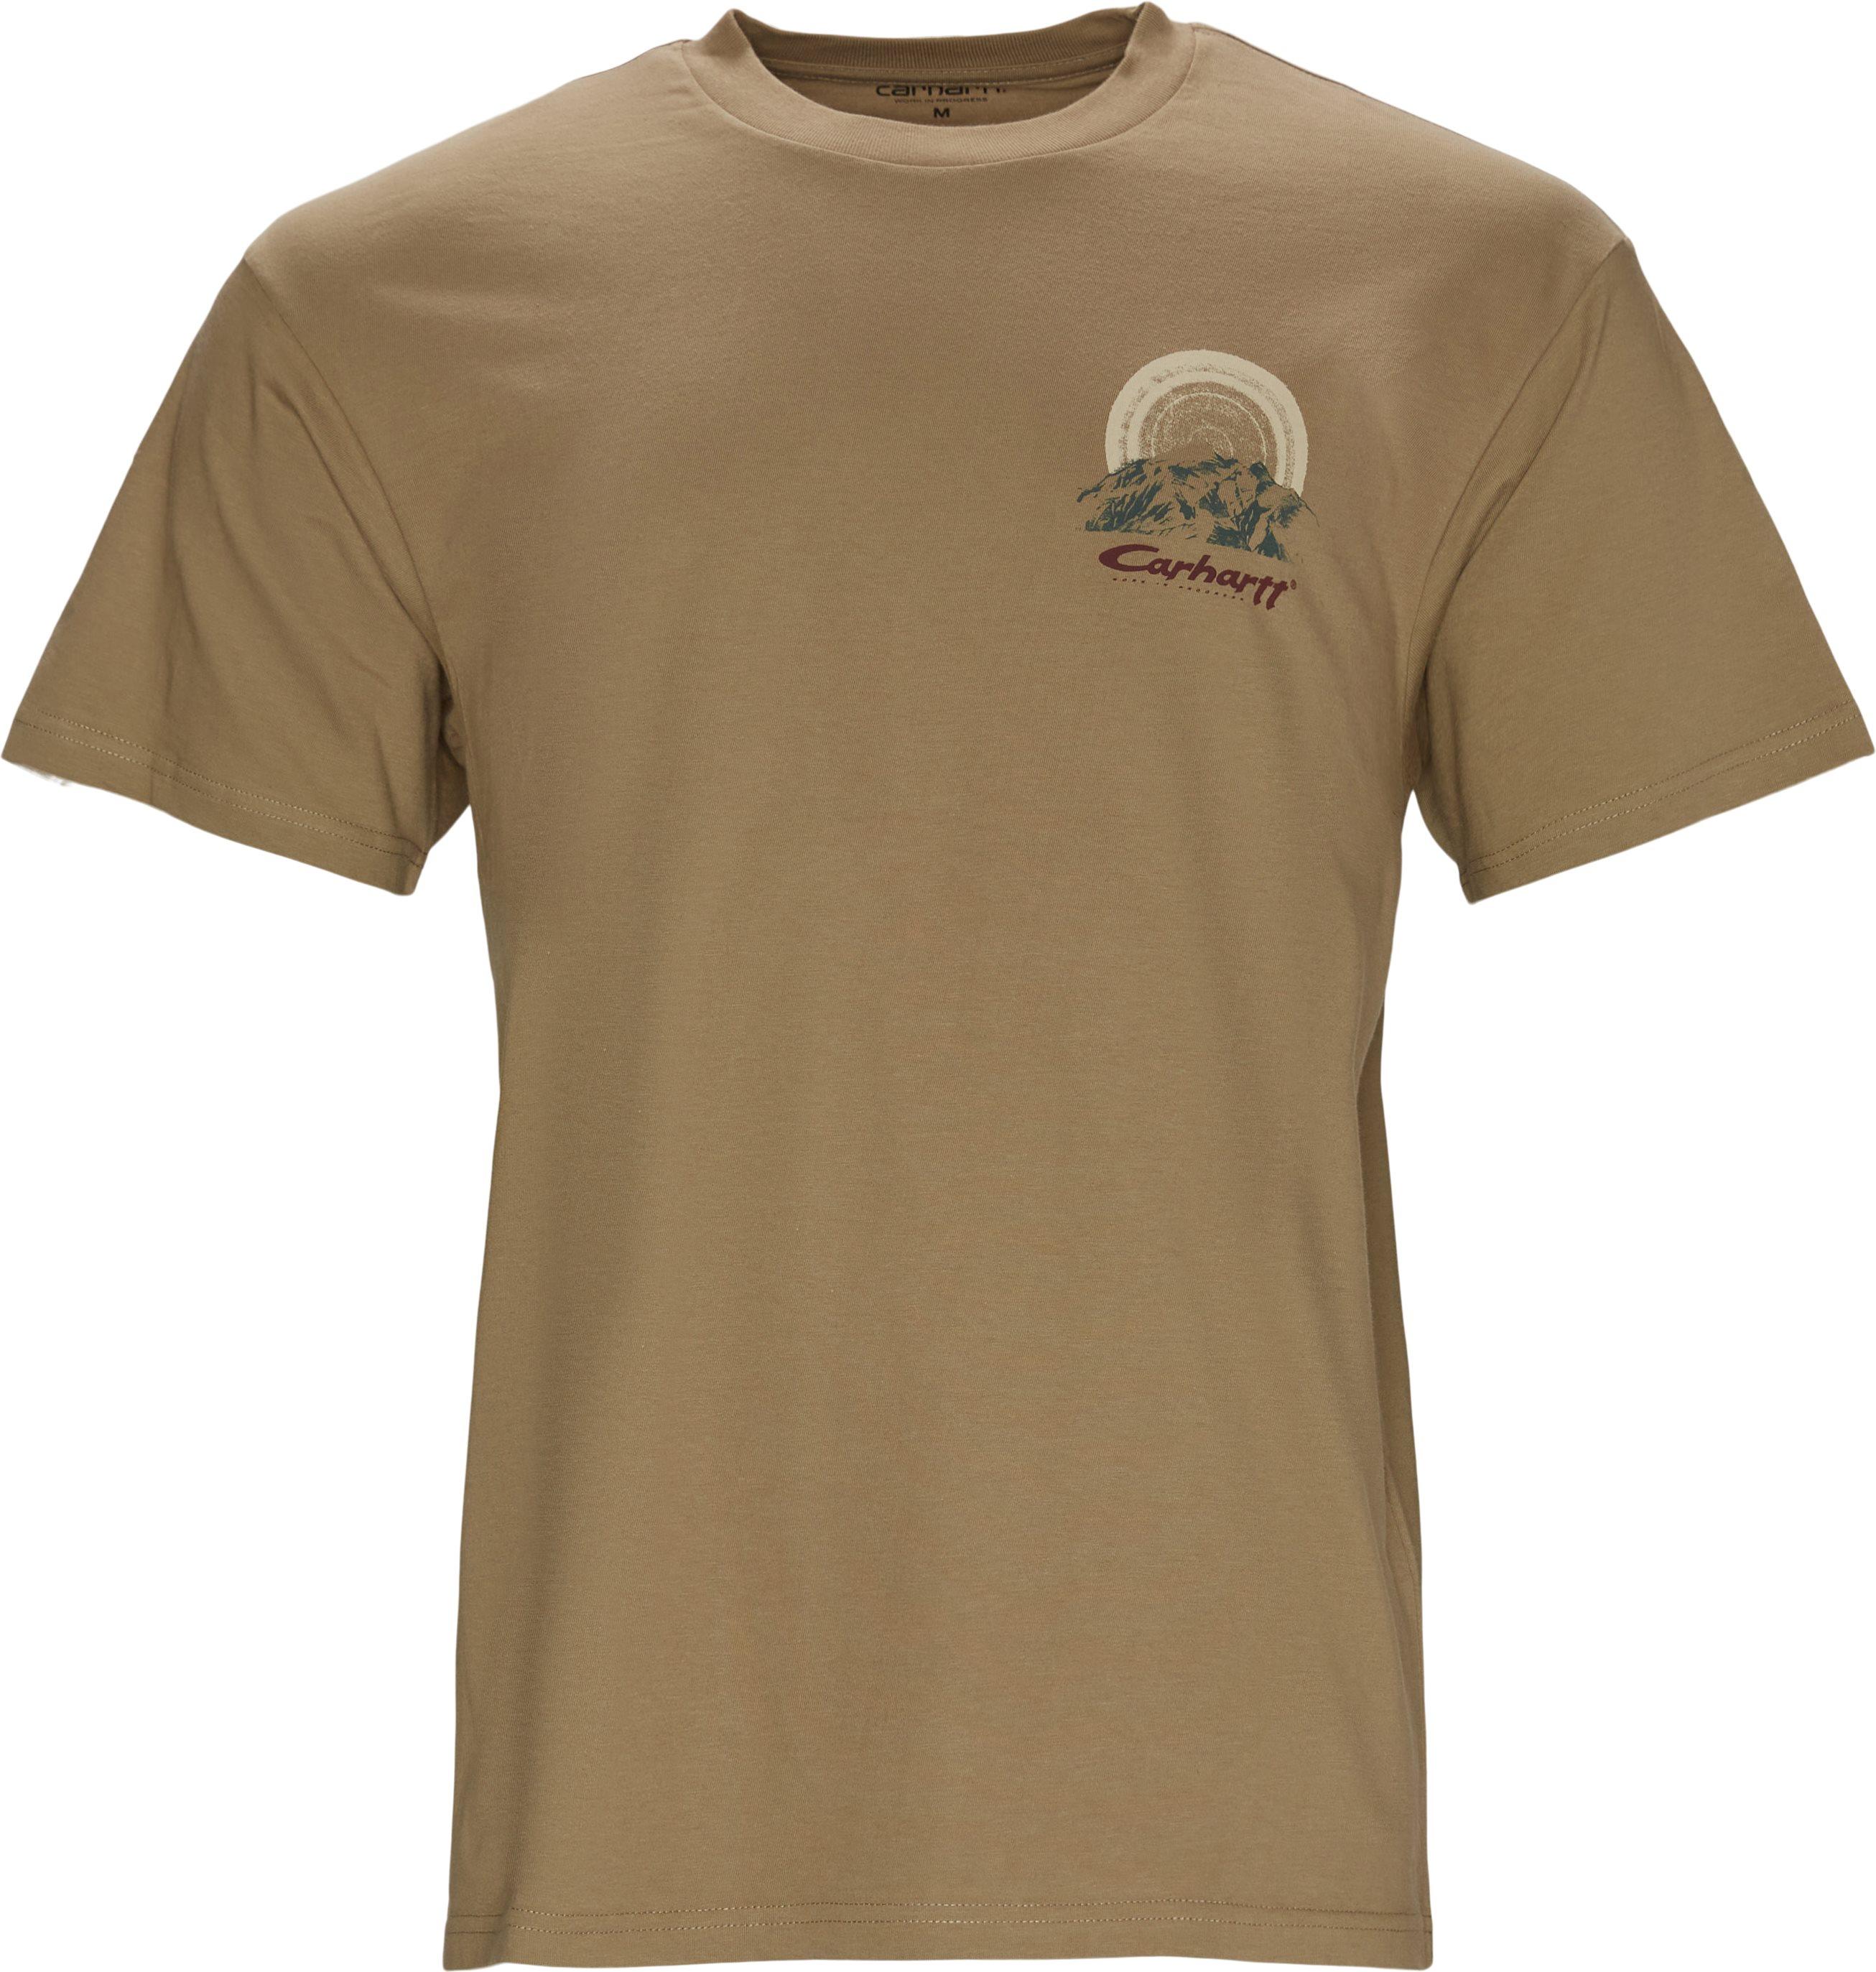 Mountain Tee - T-shirts - Regular fit - Sand